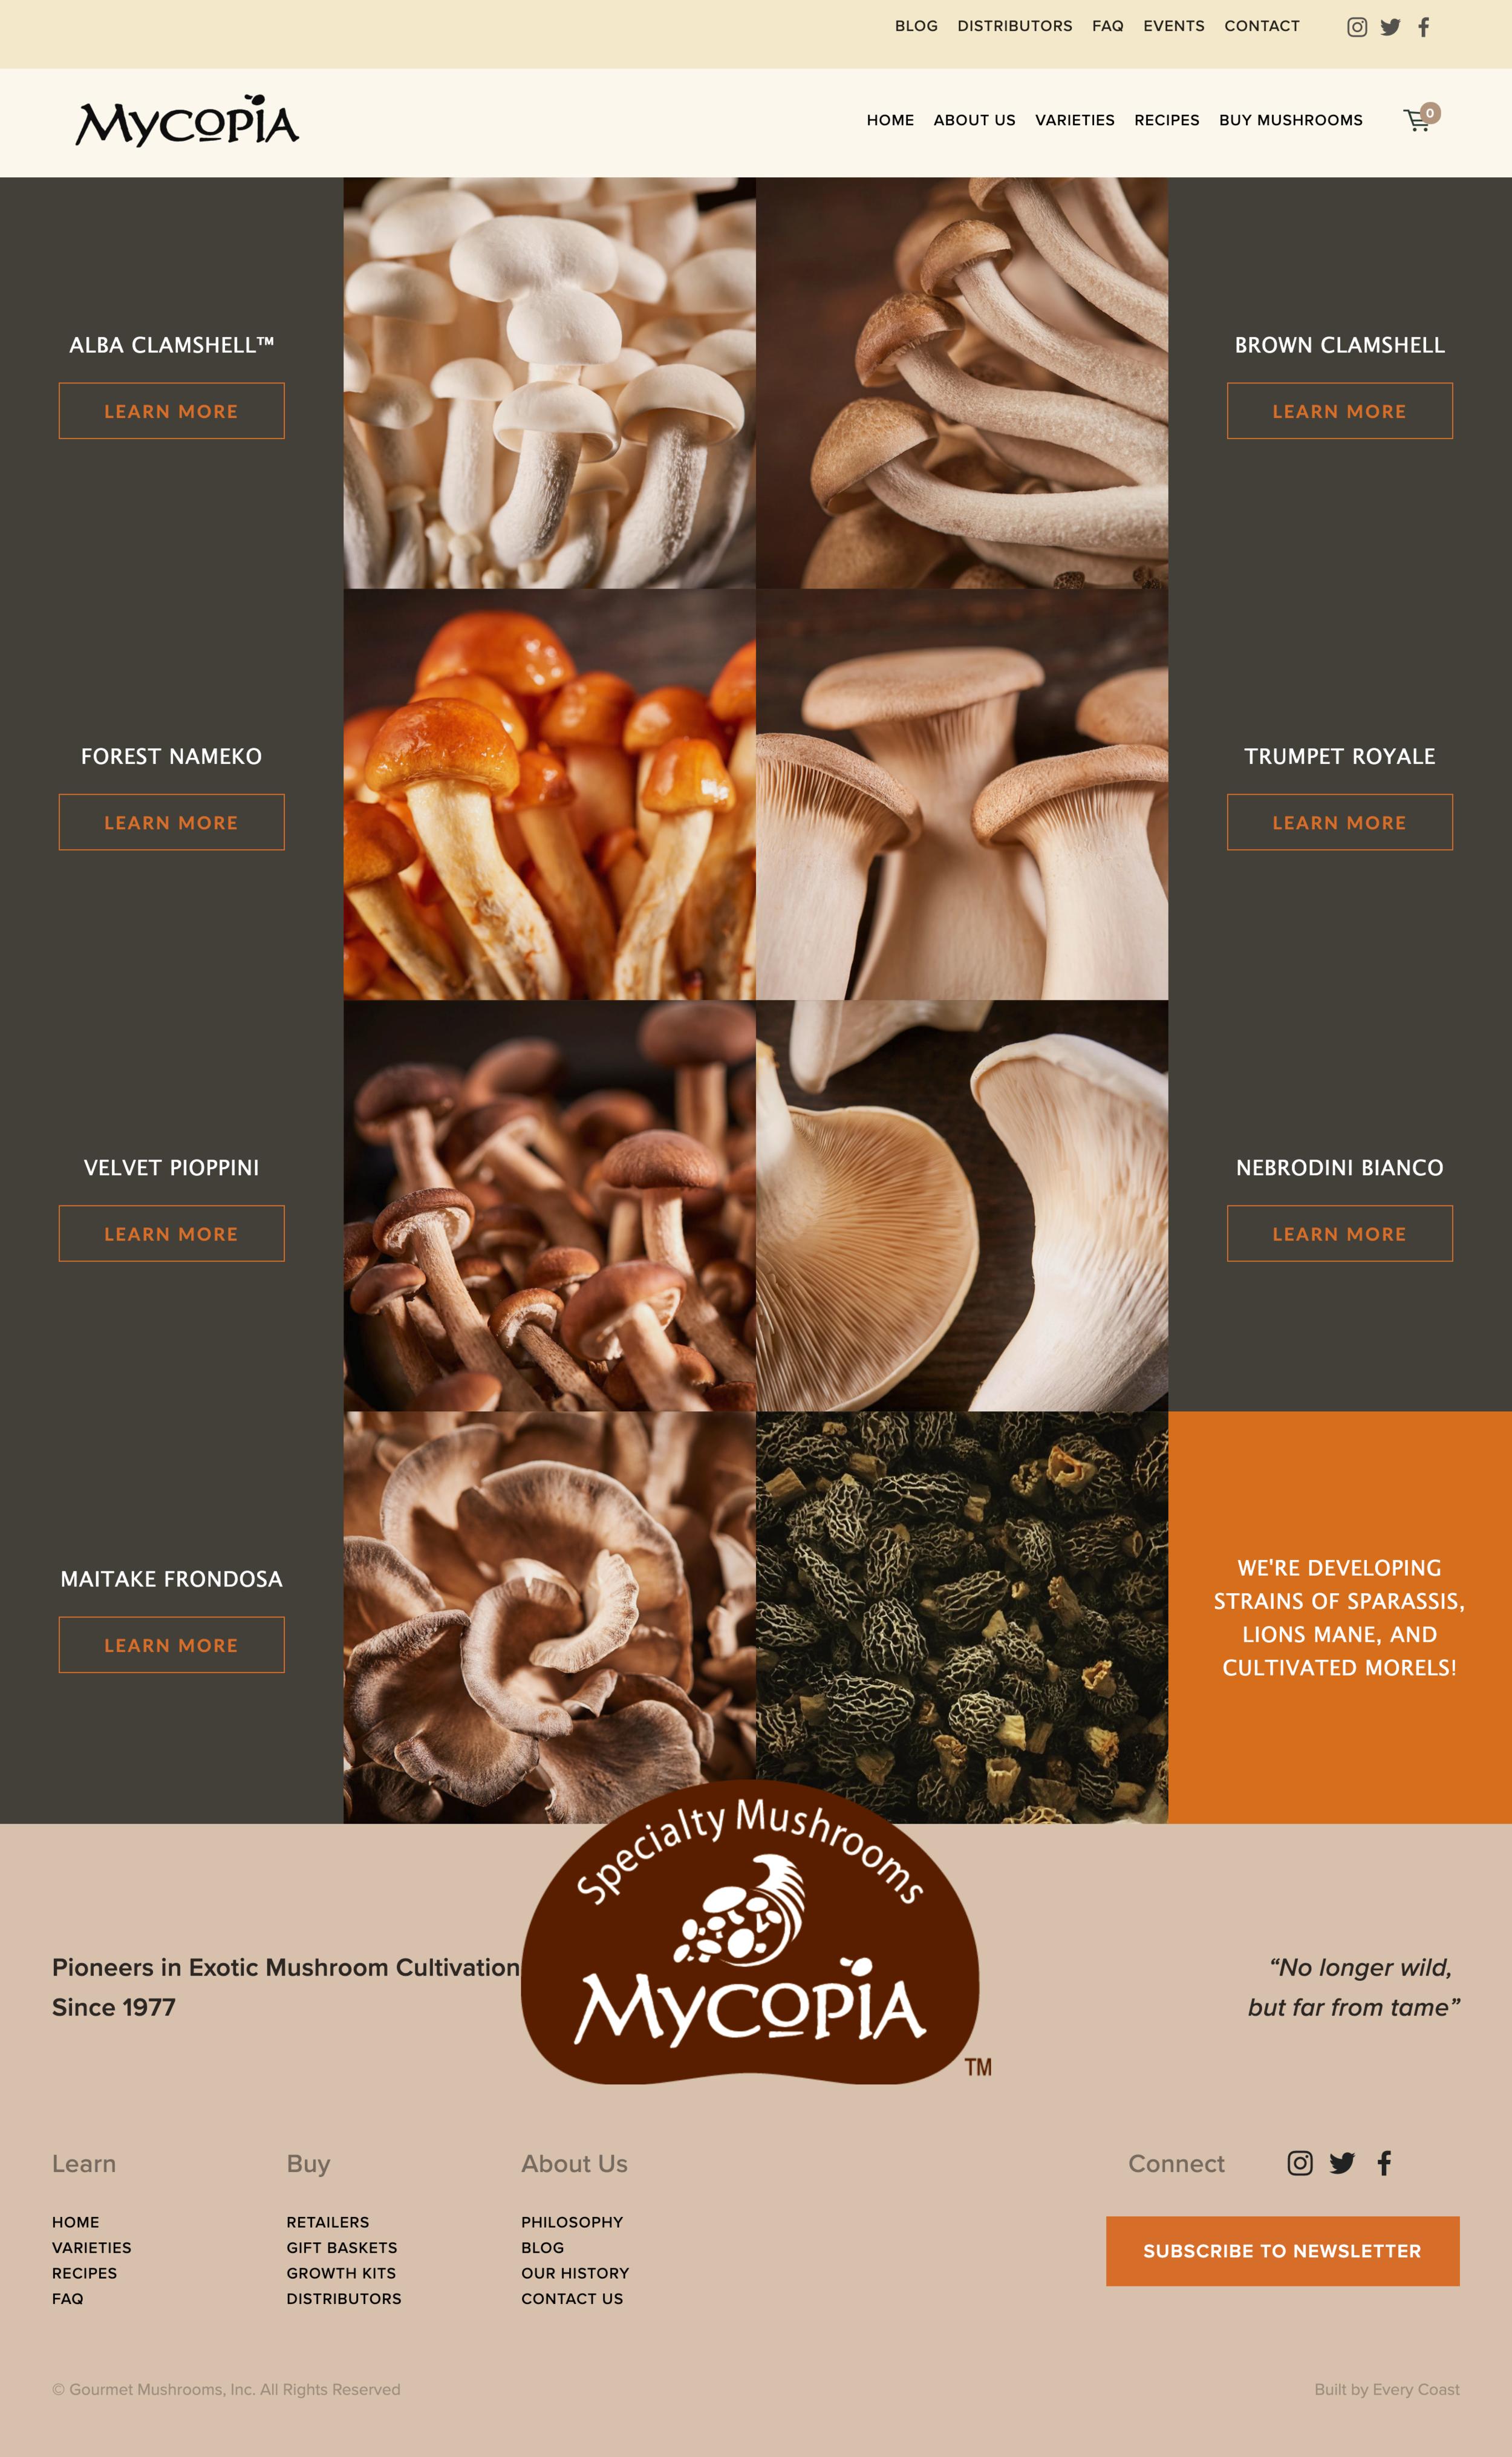 screencapture-mycopia-fresh-mushrooms-2019-05-15-17_00_02.png